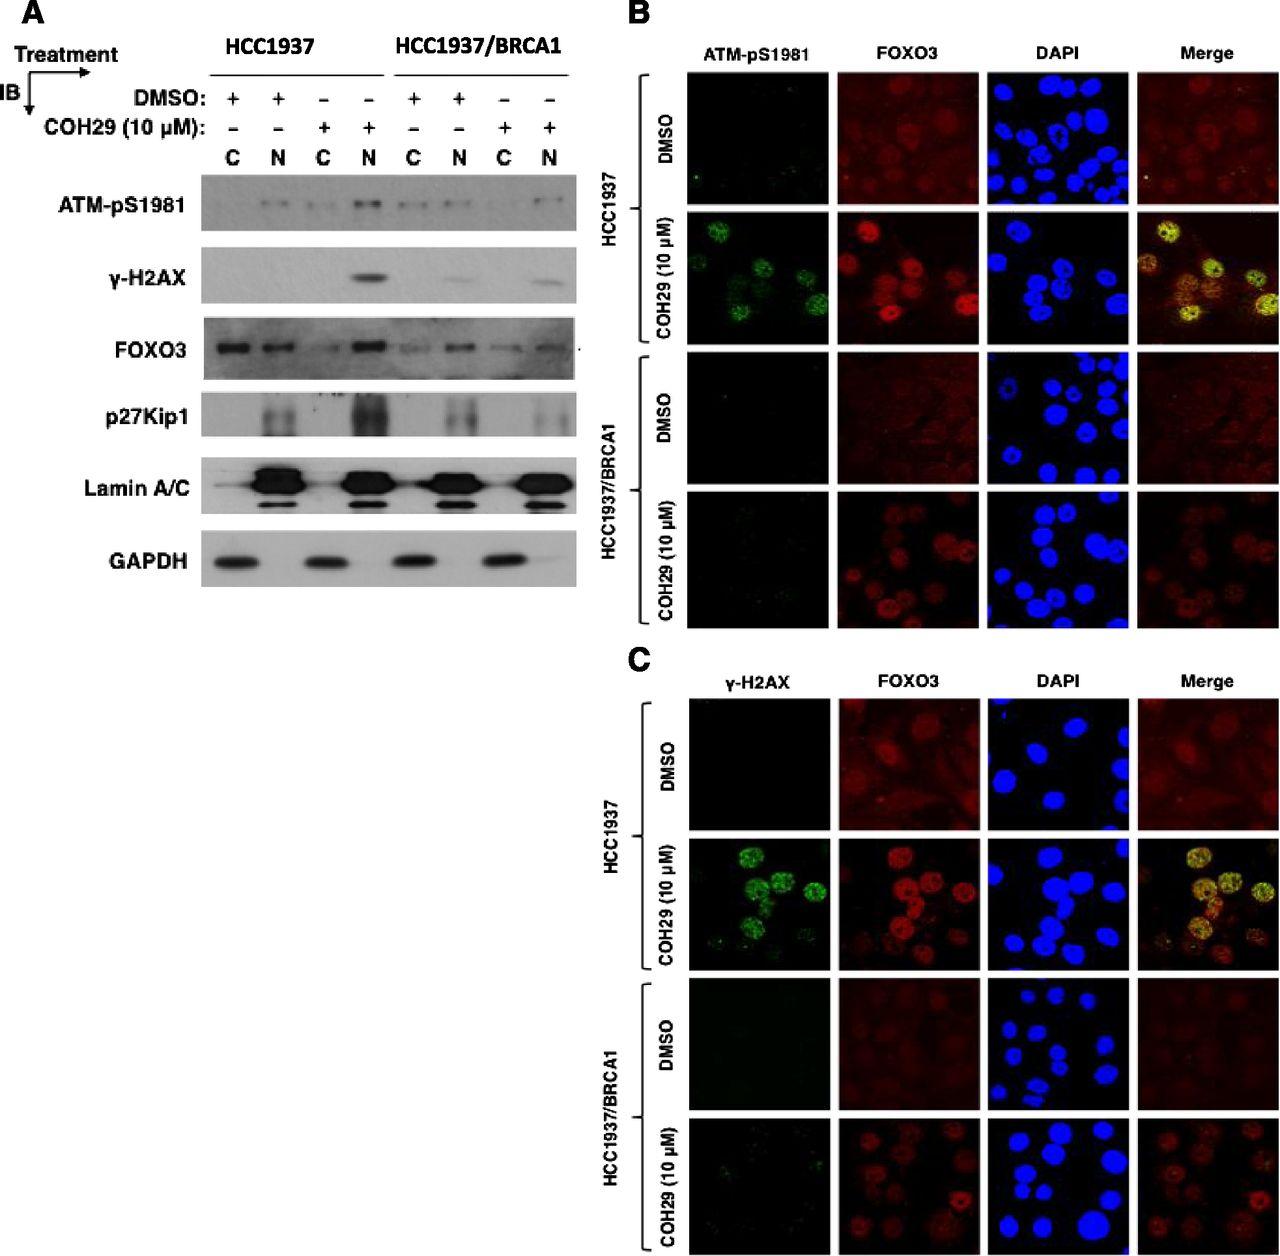 The Novel Ribonucleotide Reductase Inhibitor COH29 Inhibits DNA